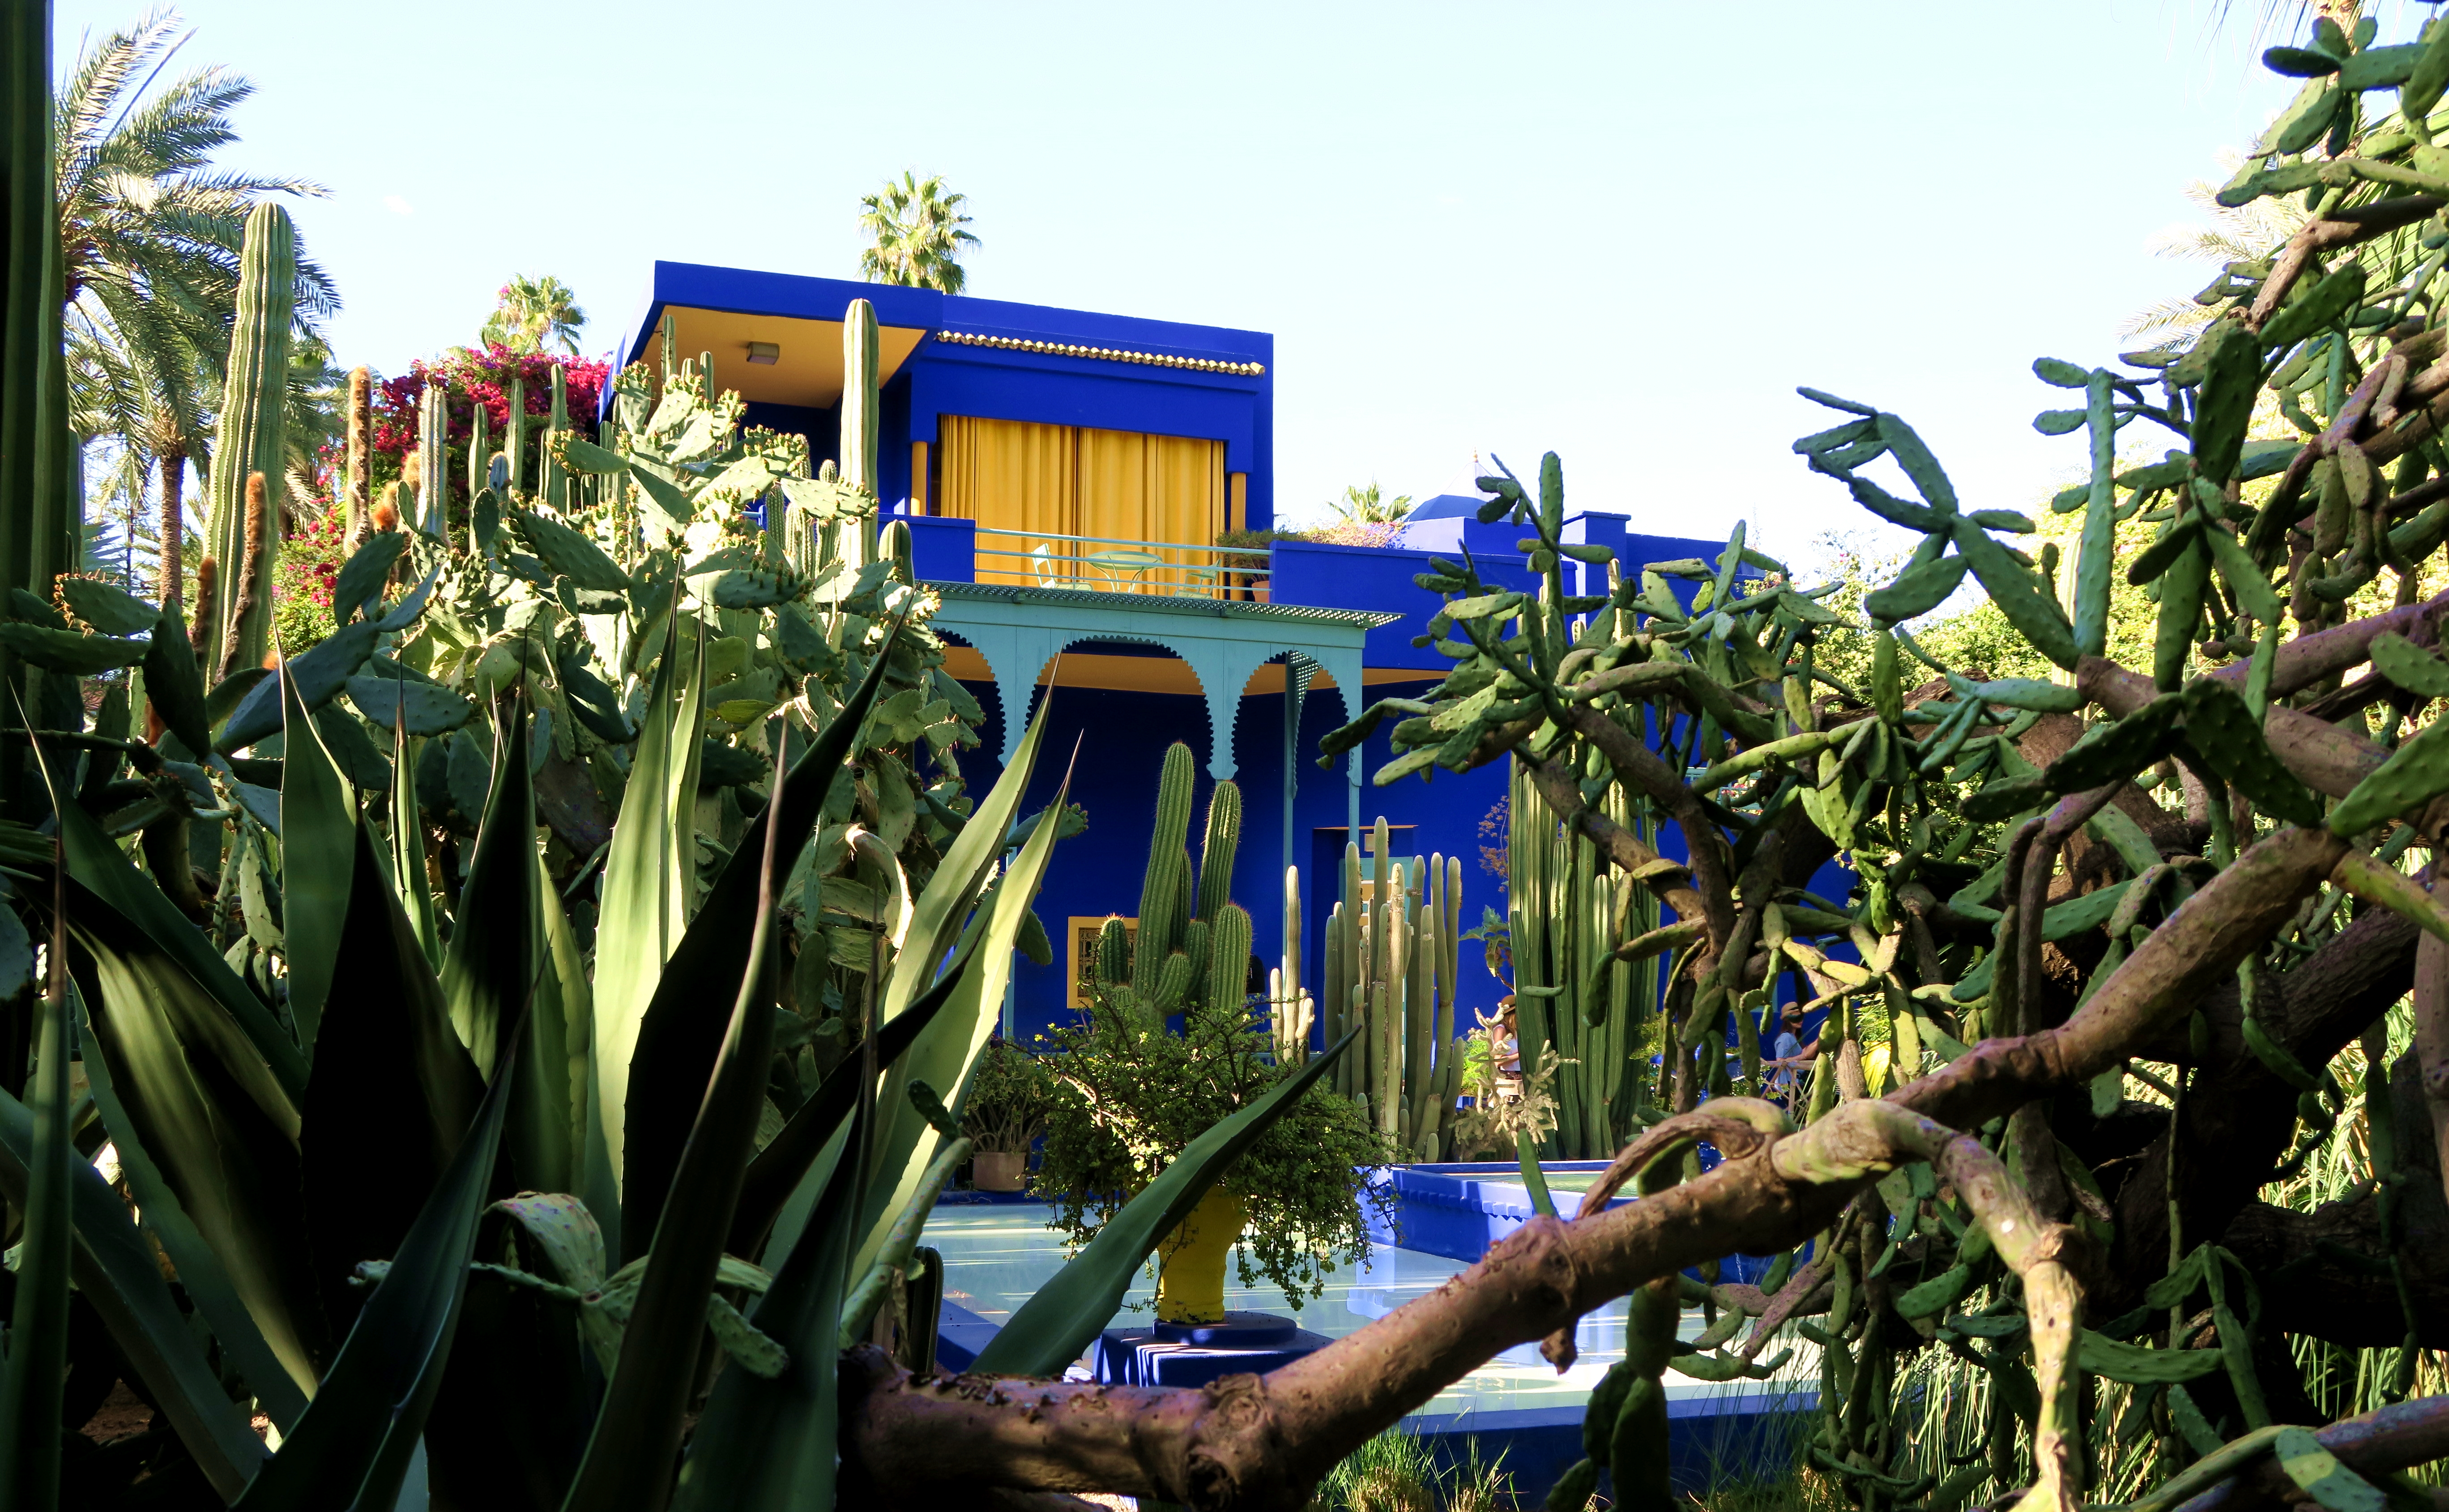 Marakech Jardin Marjorelle Cacti